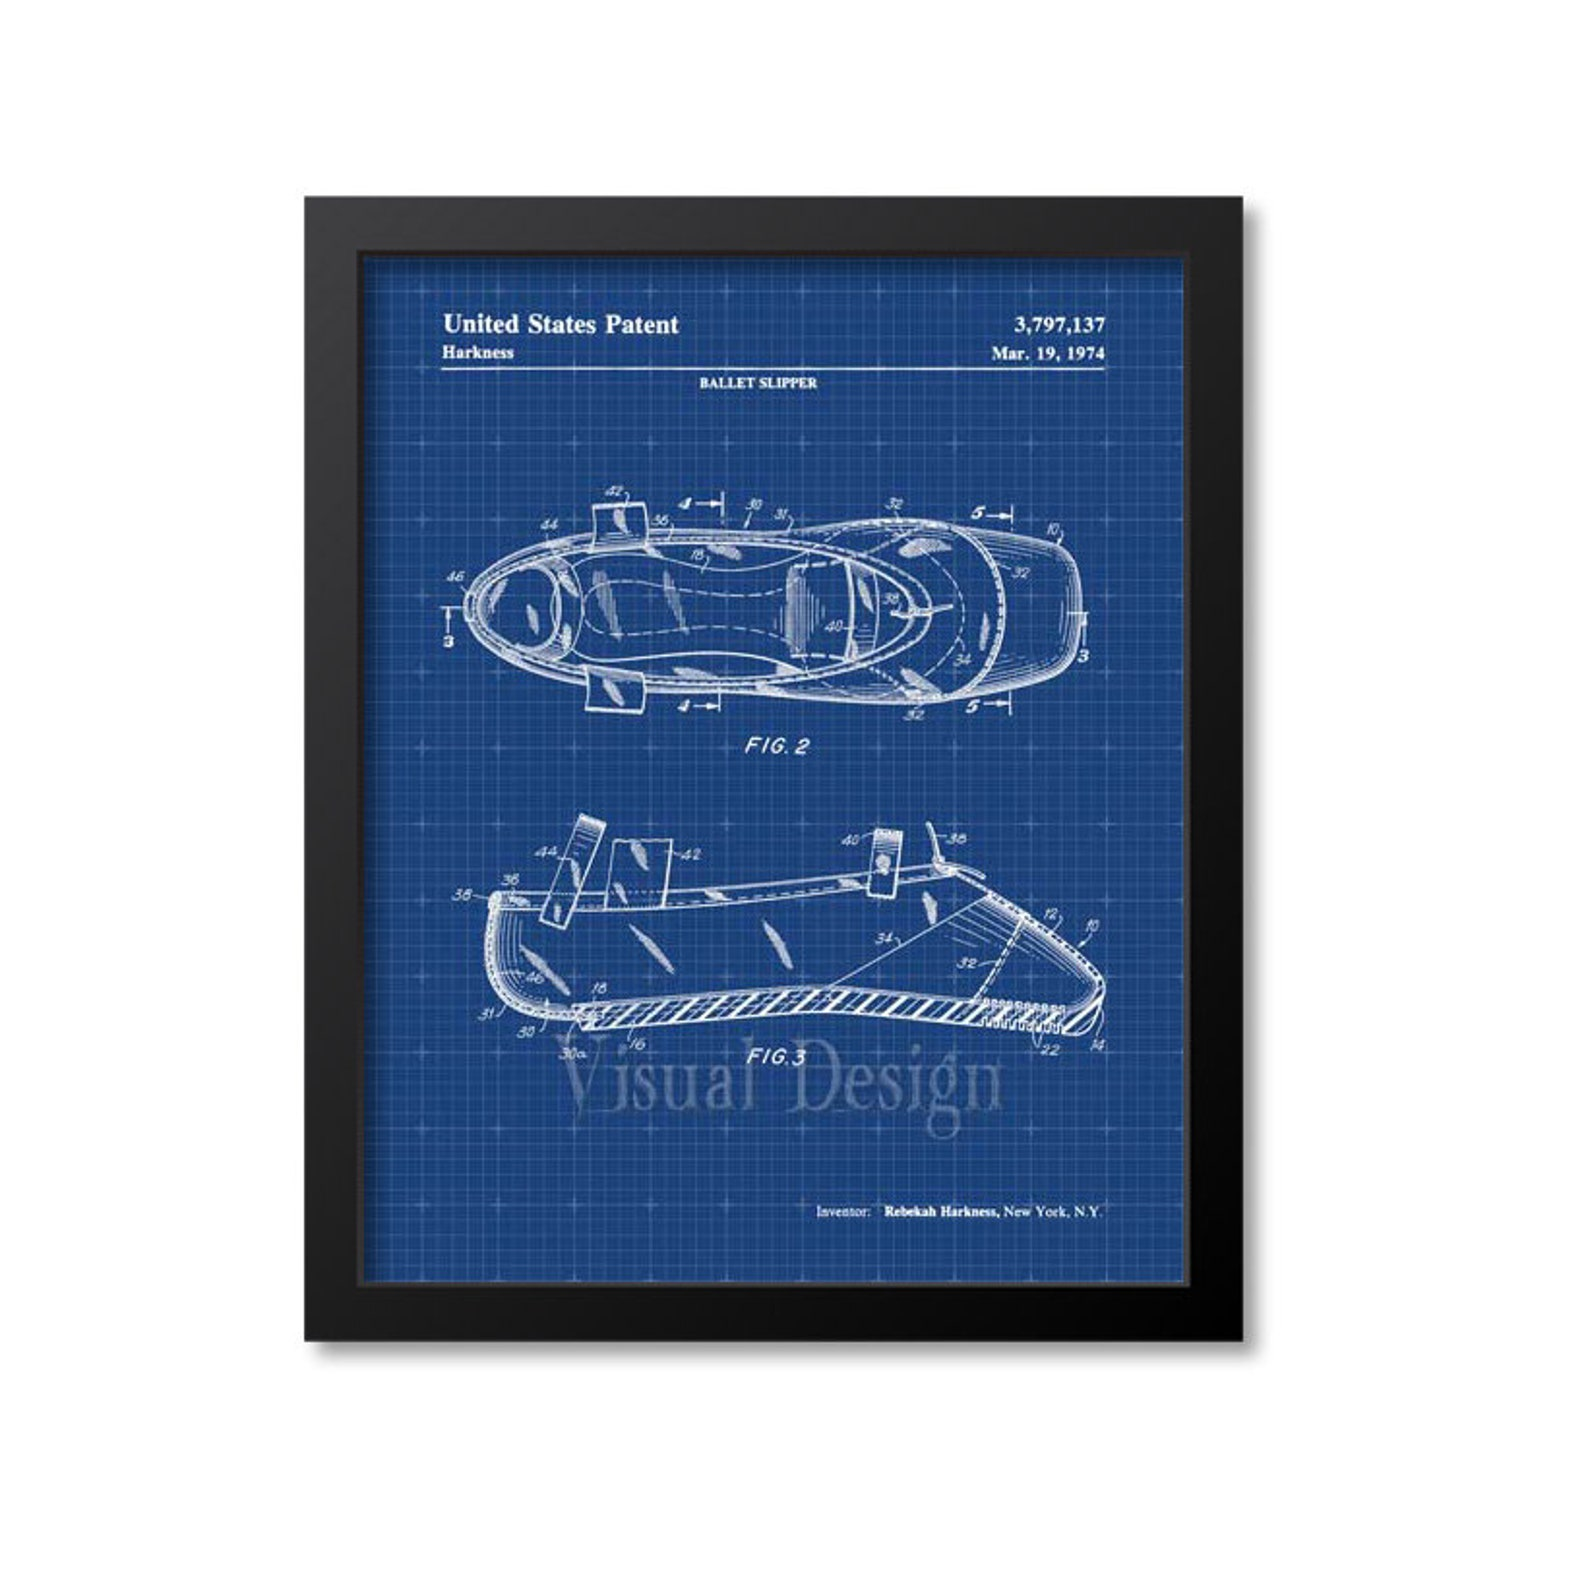 ballet shoe patent print, ballet patent art, ballet poster, ballerina art, dance art print, dancer gift